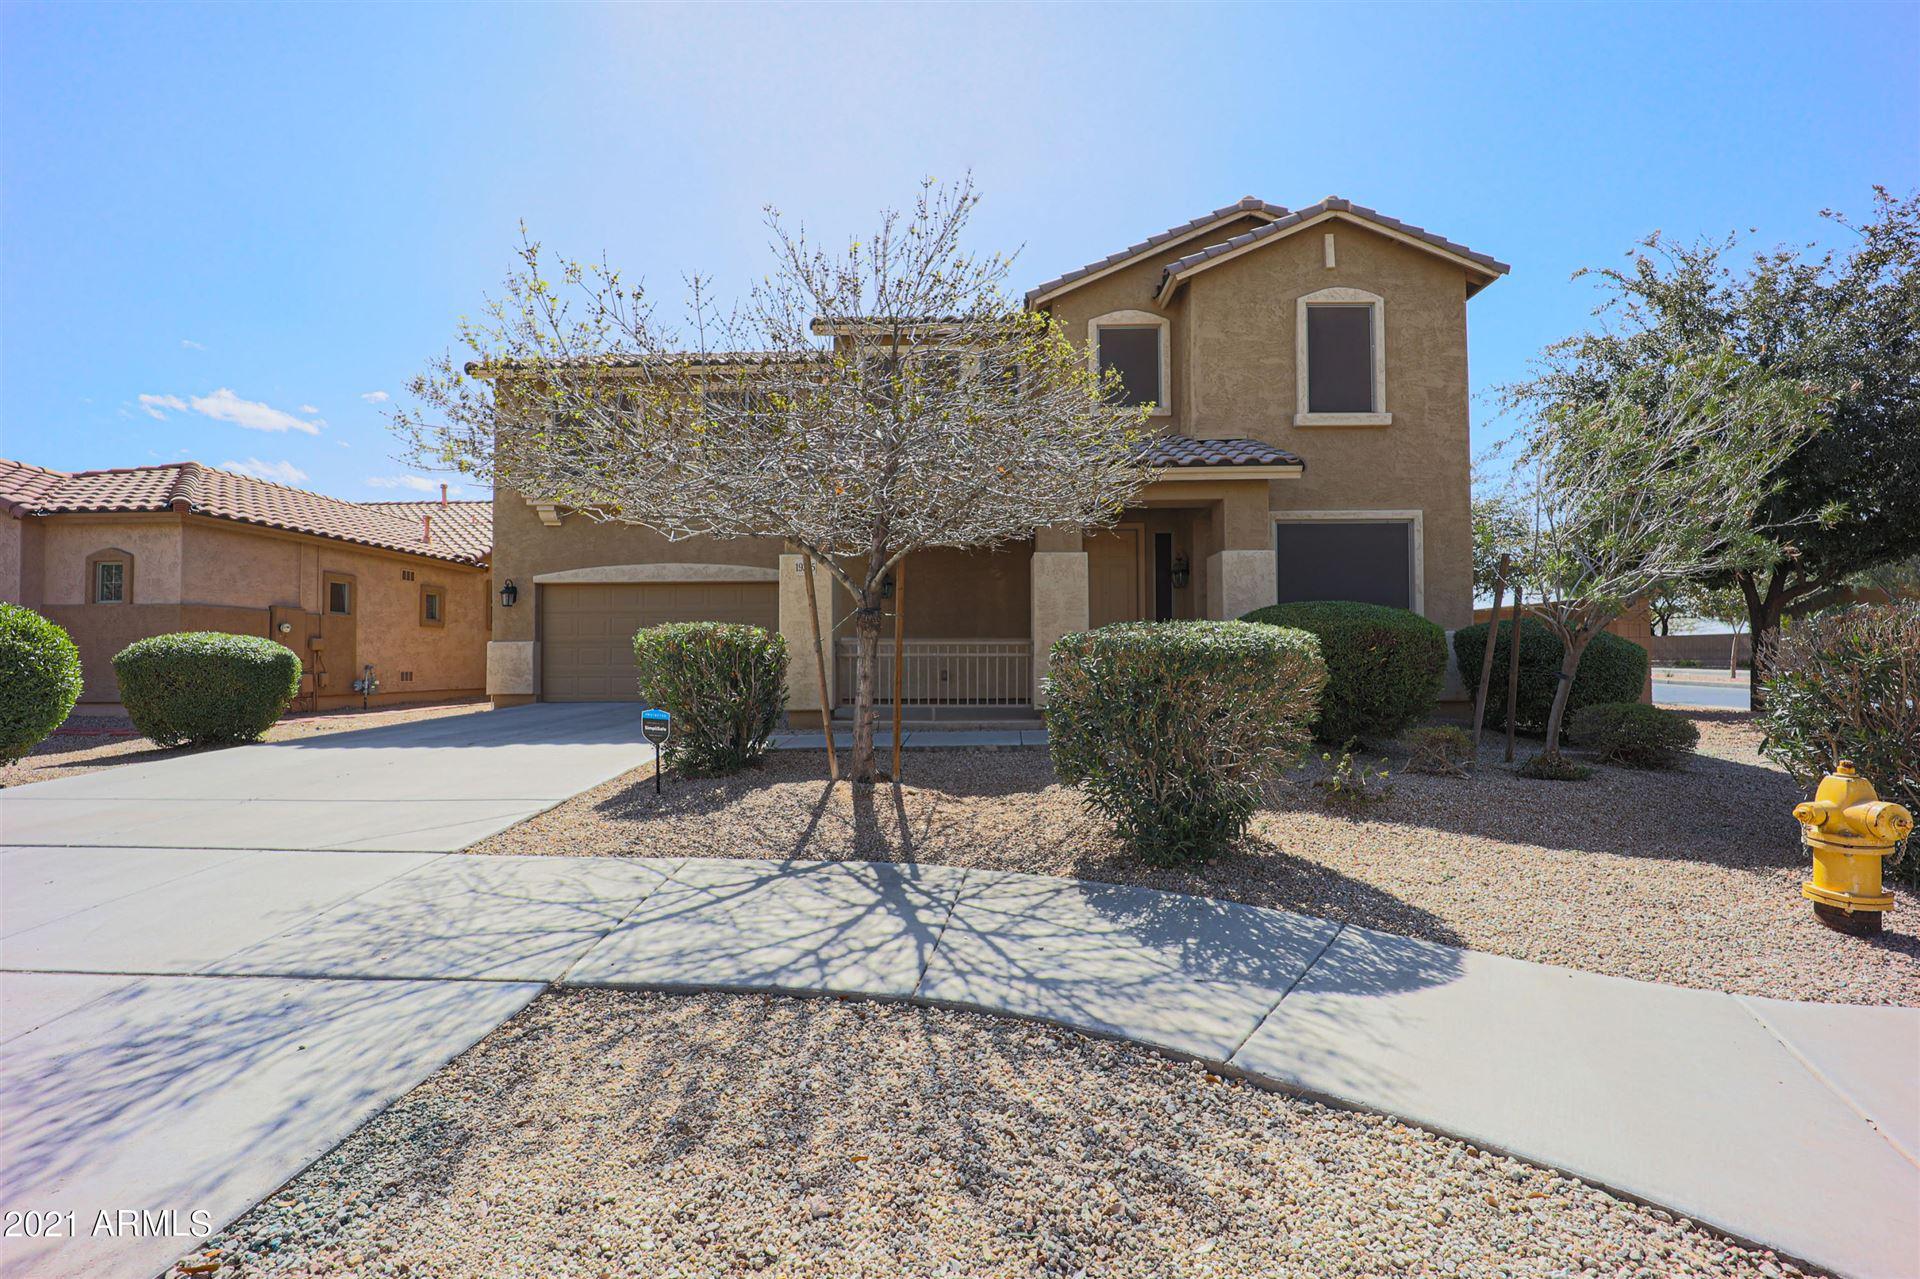 Photo of 19305 E THORNTON Road, Queen Creek, AZ 85142 (MLS # 6202933)